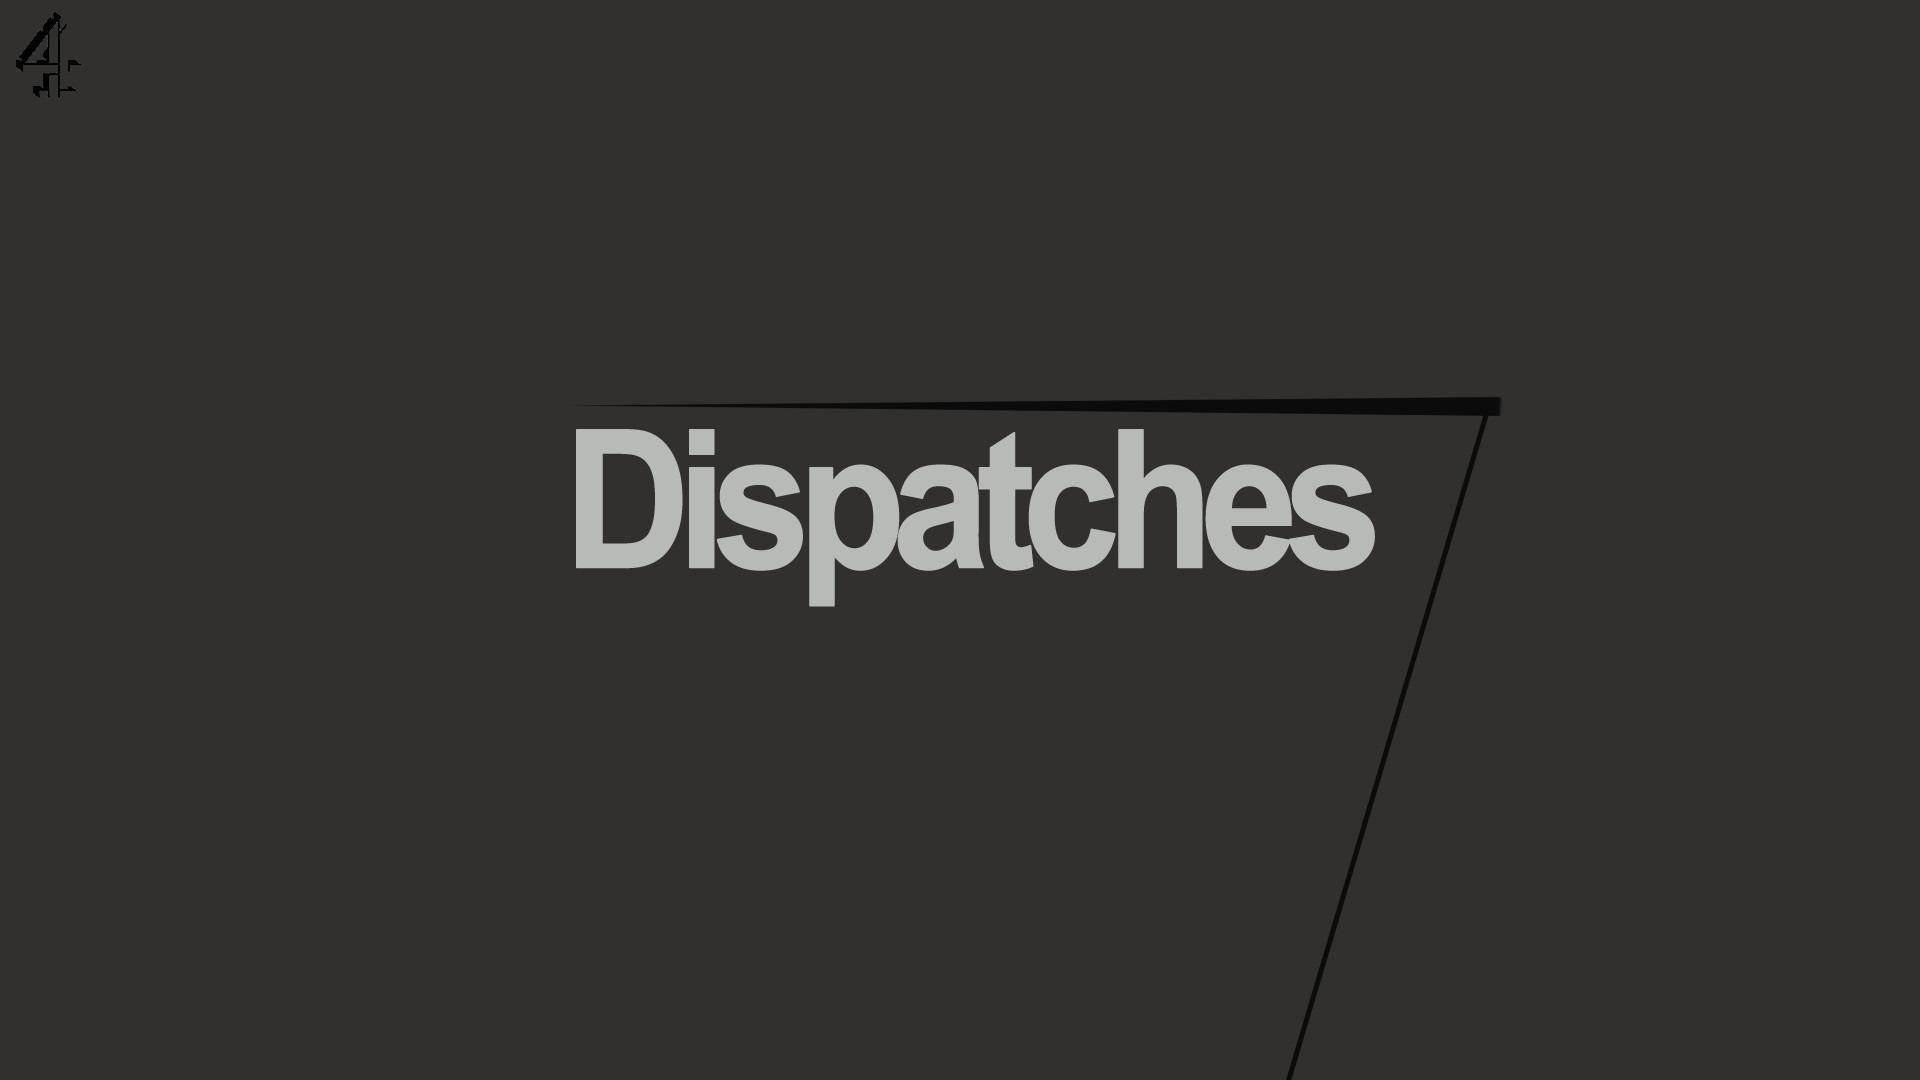 Show Dispatches